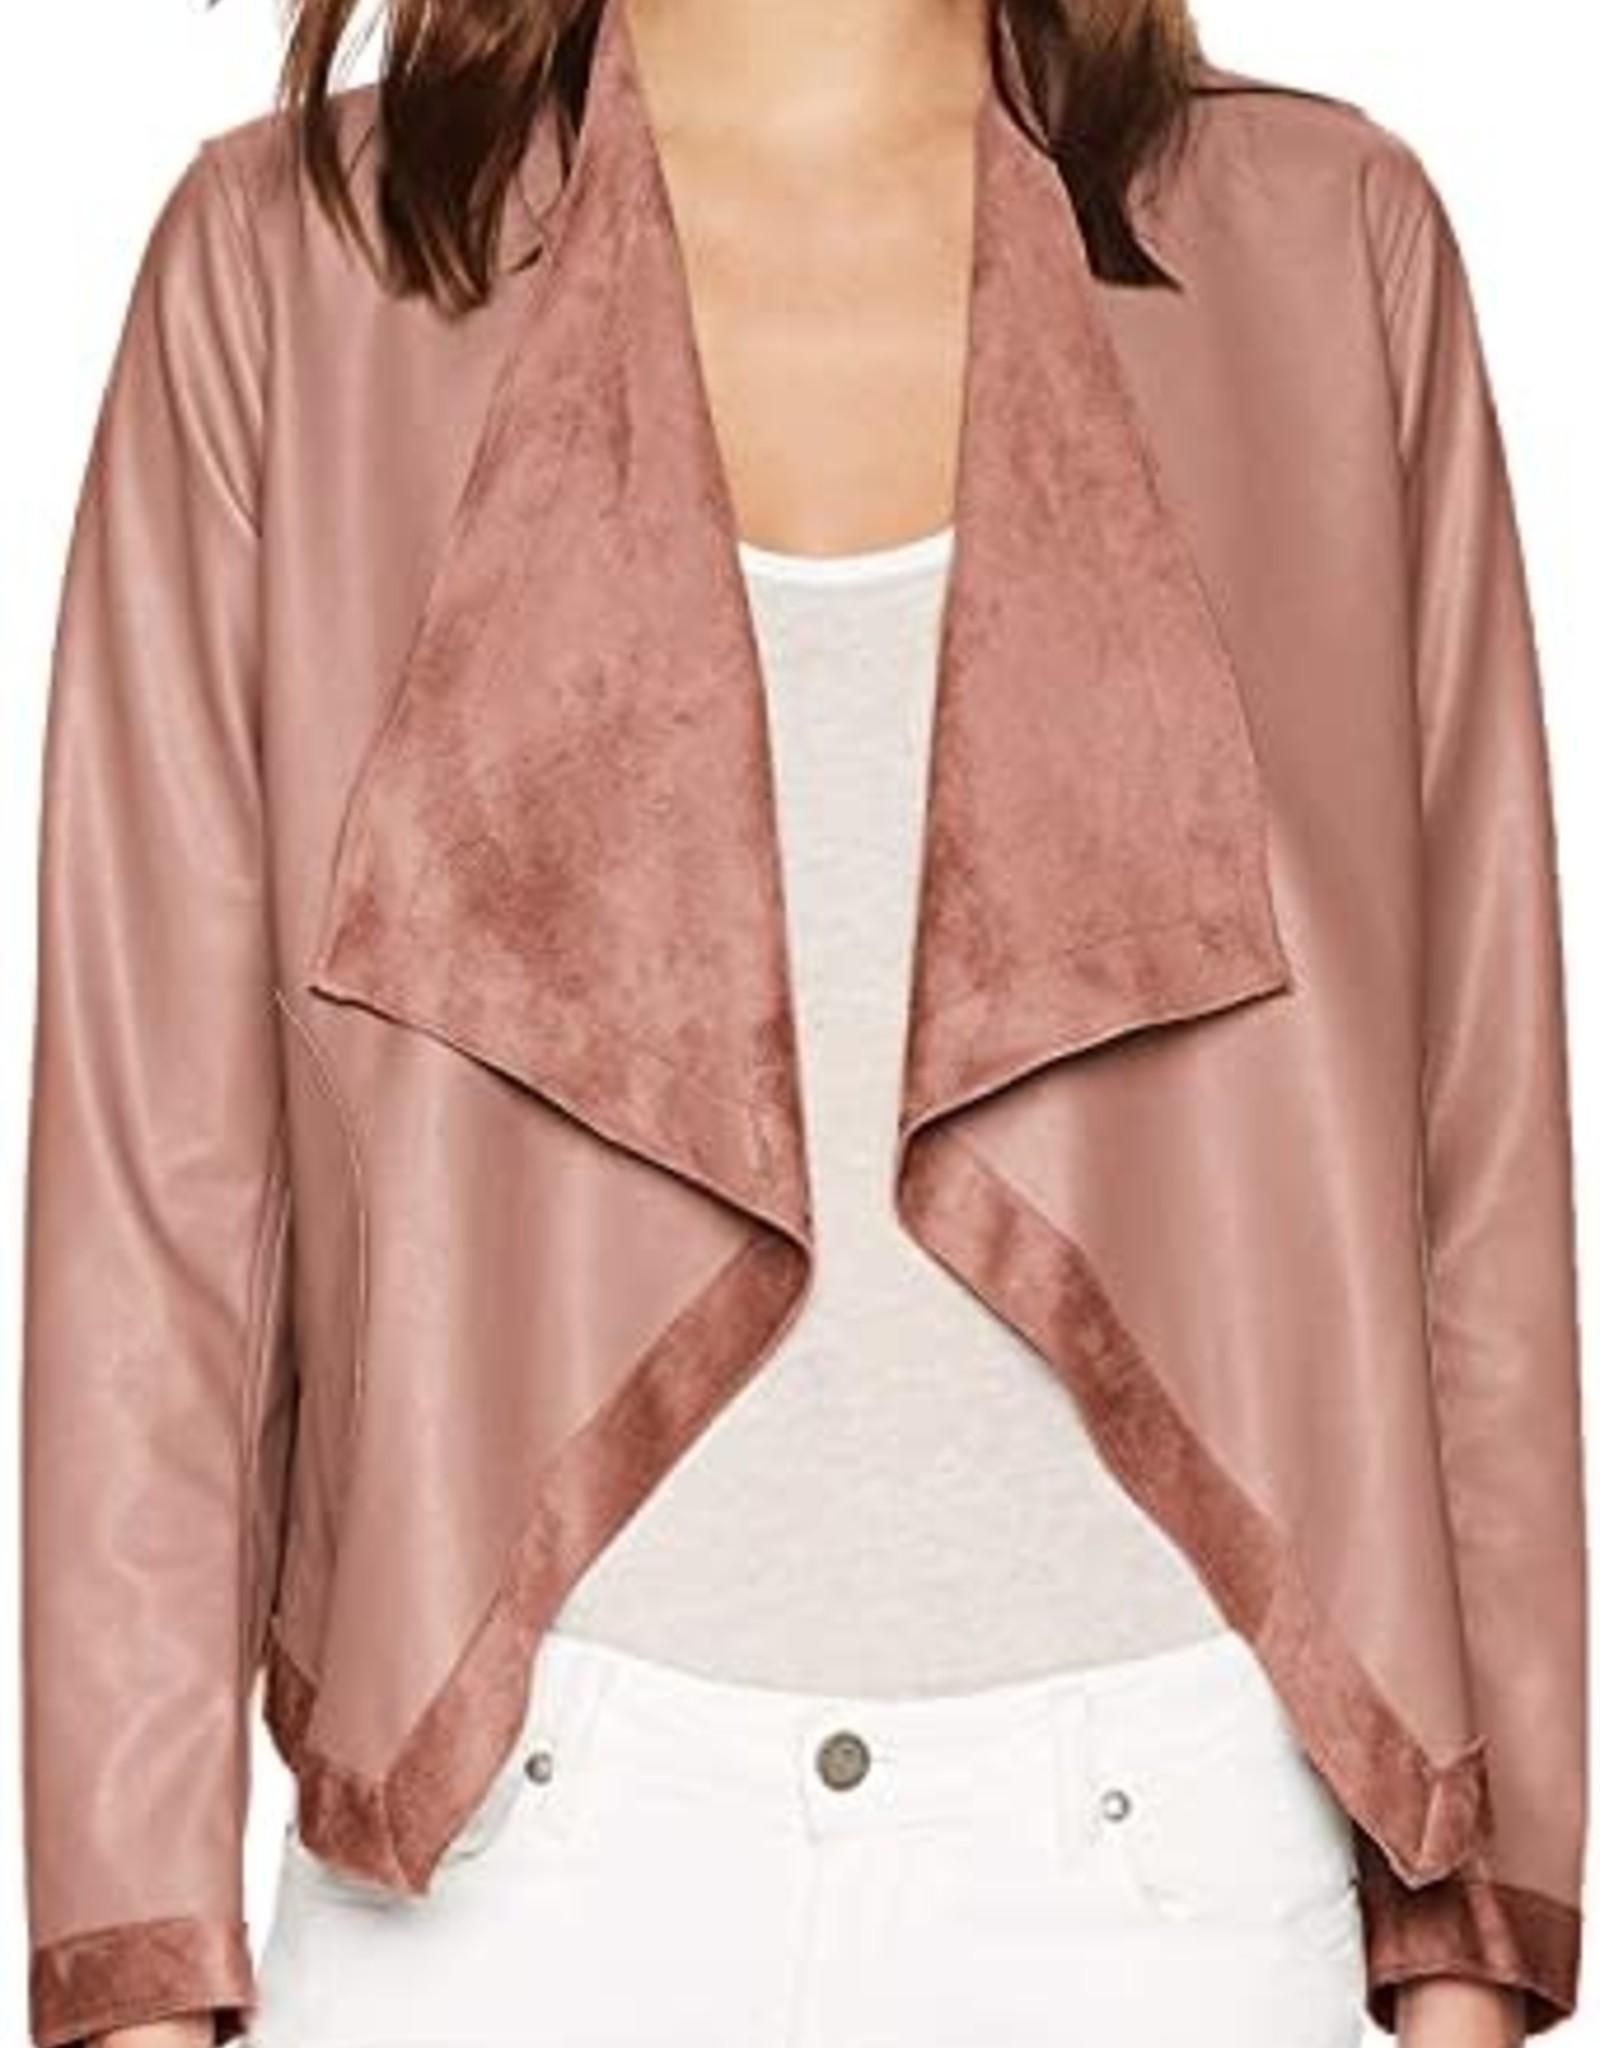 BB Dakota Reversible Vegan Leather/Suede Jacket - Mauve